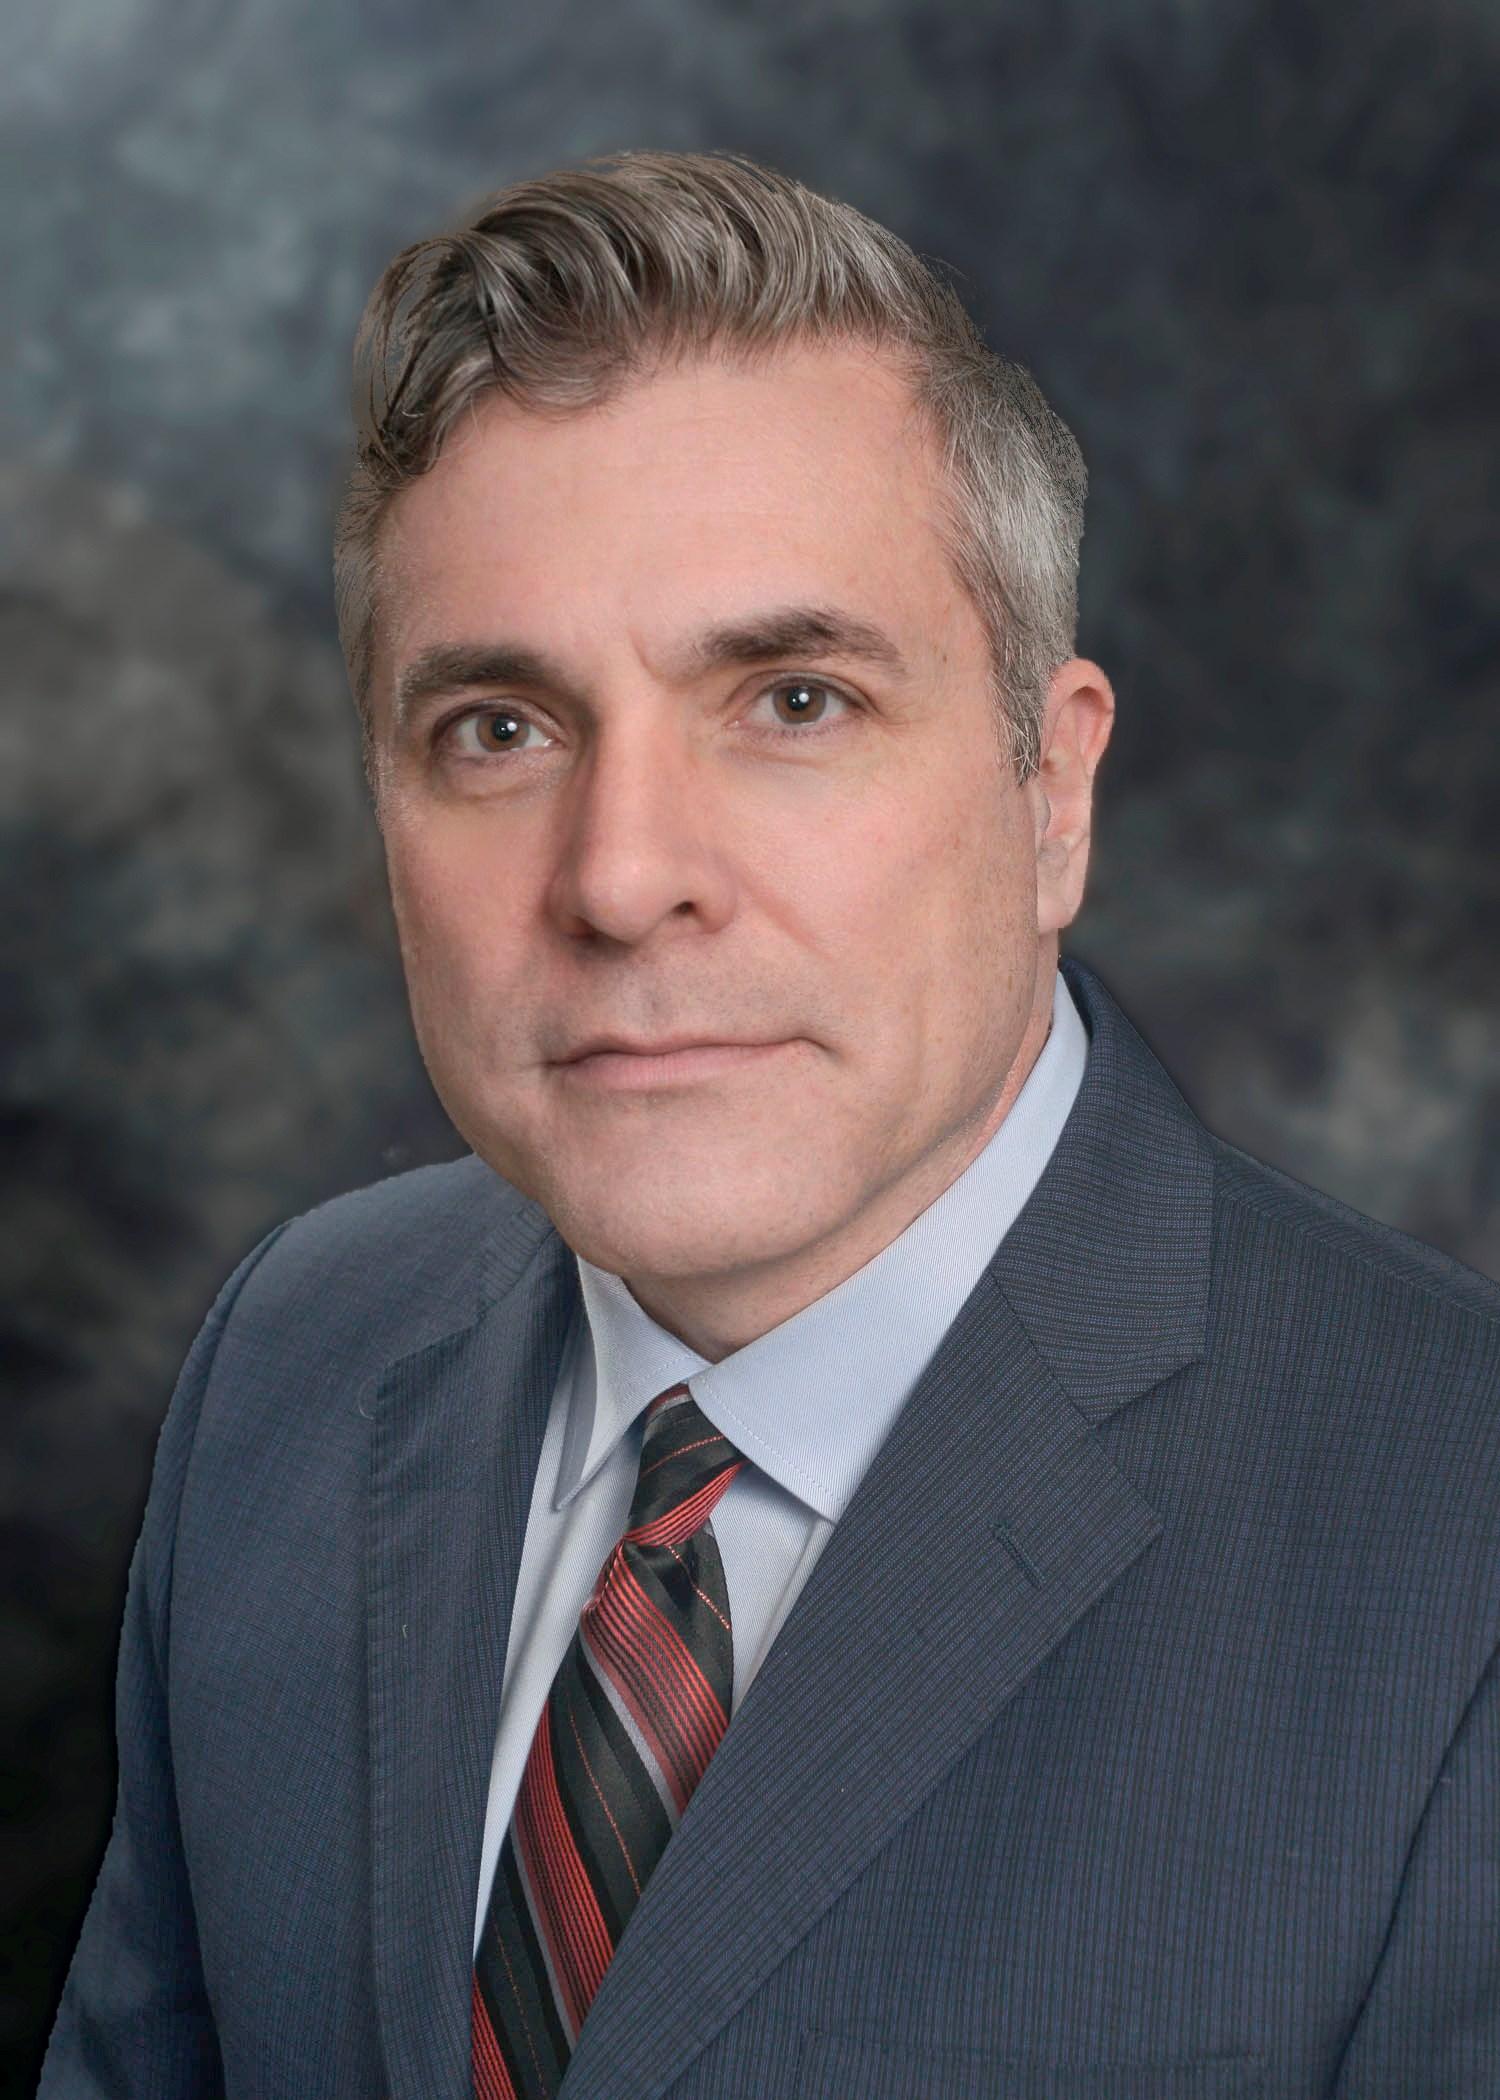 Thomas C. Moore